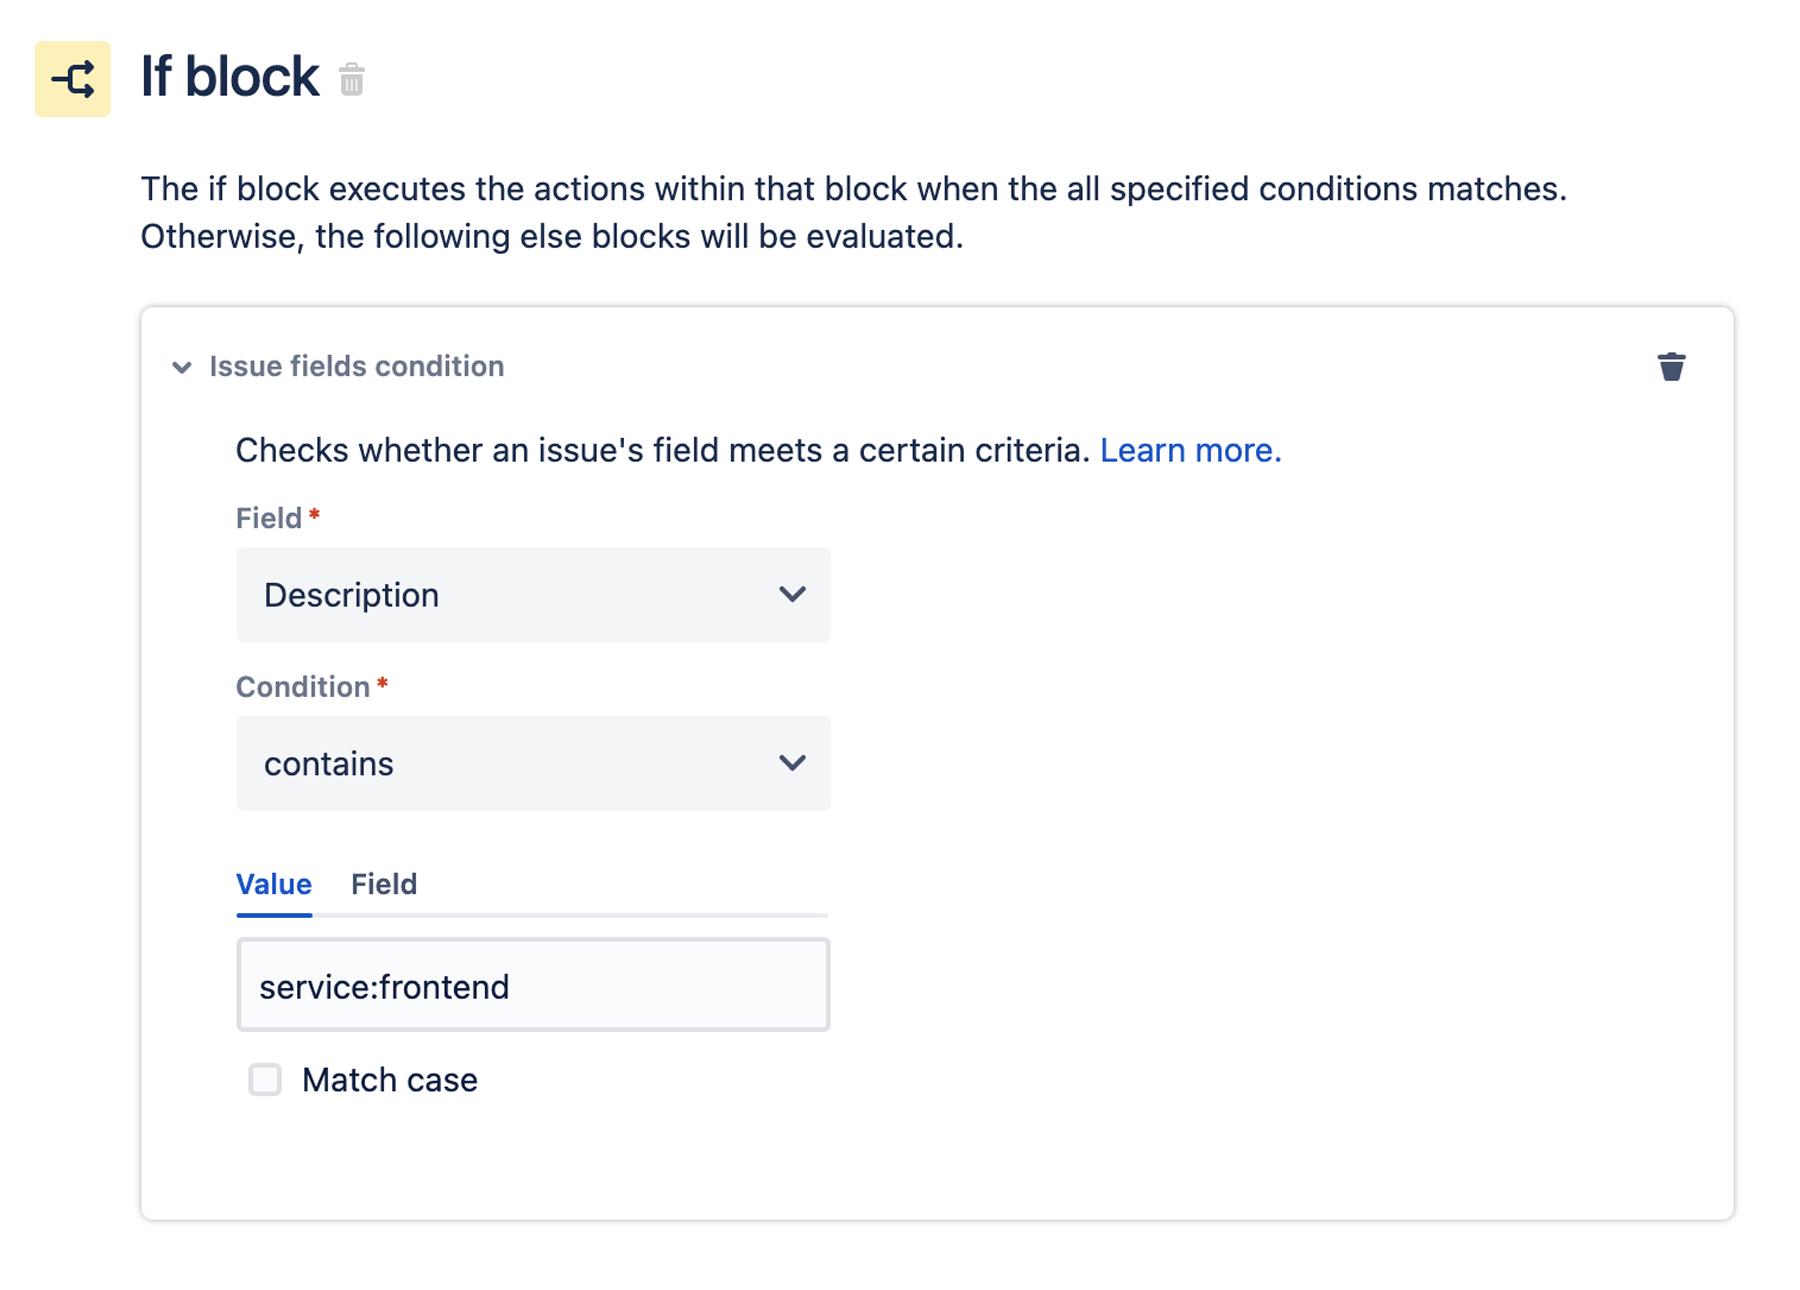 If block window